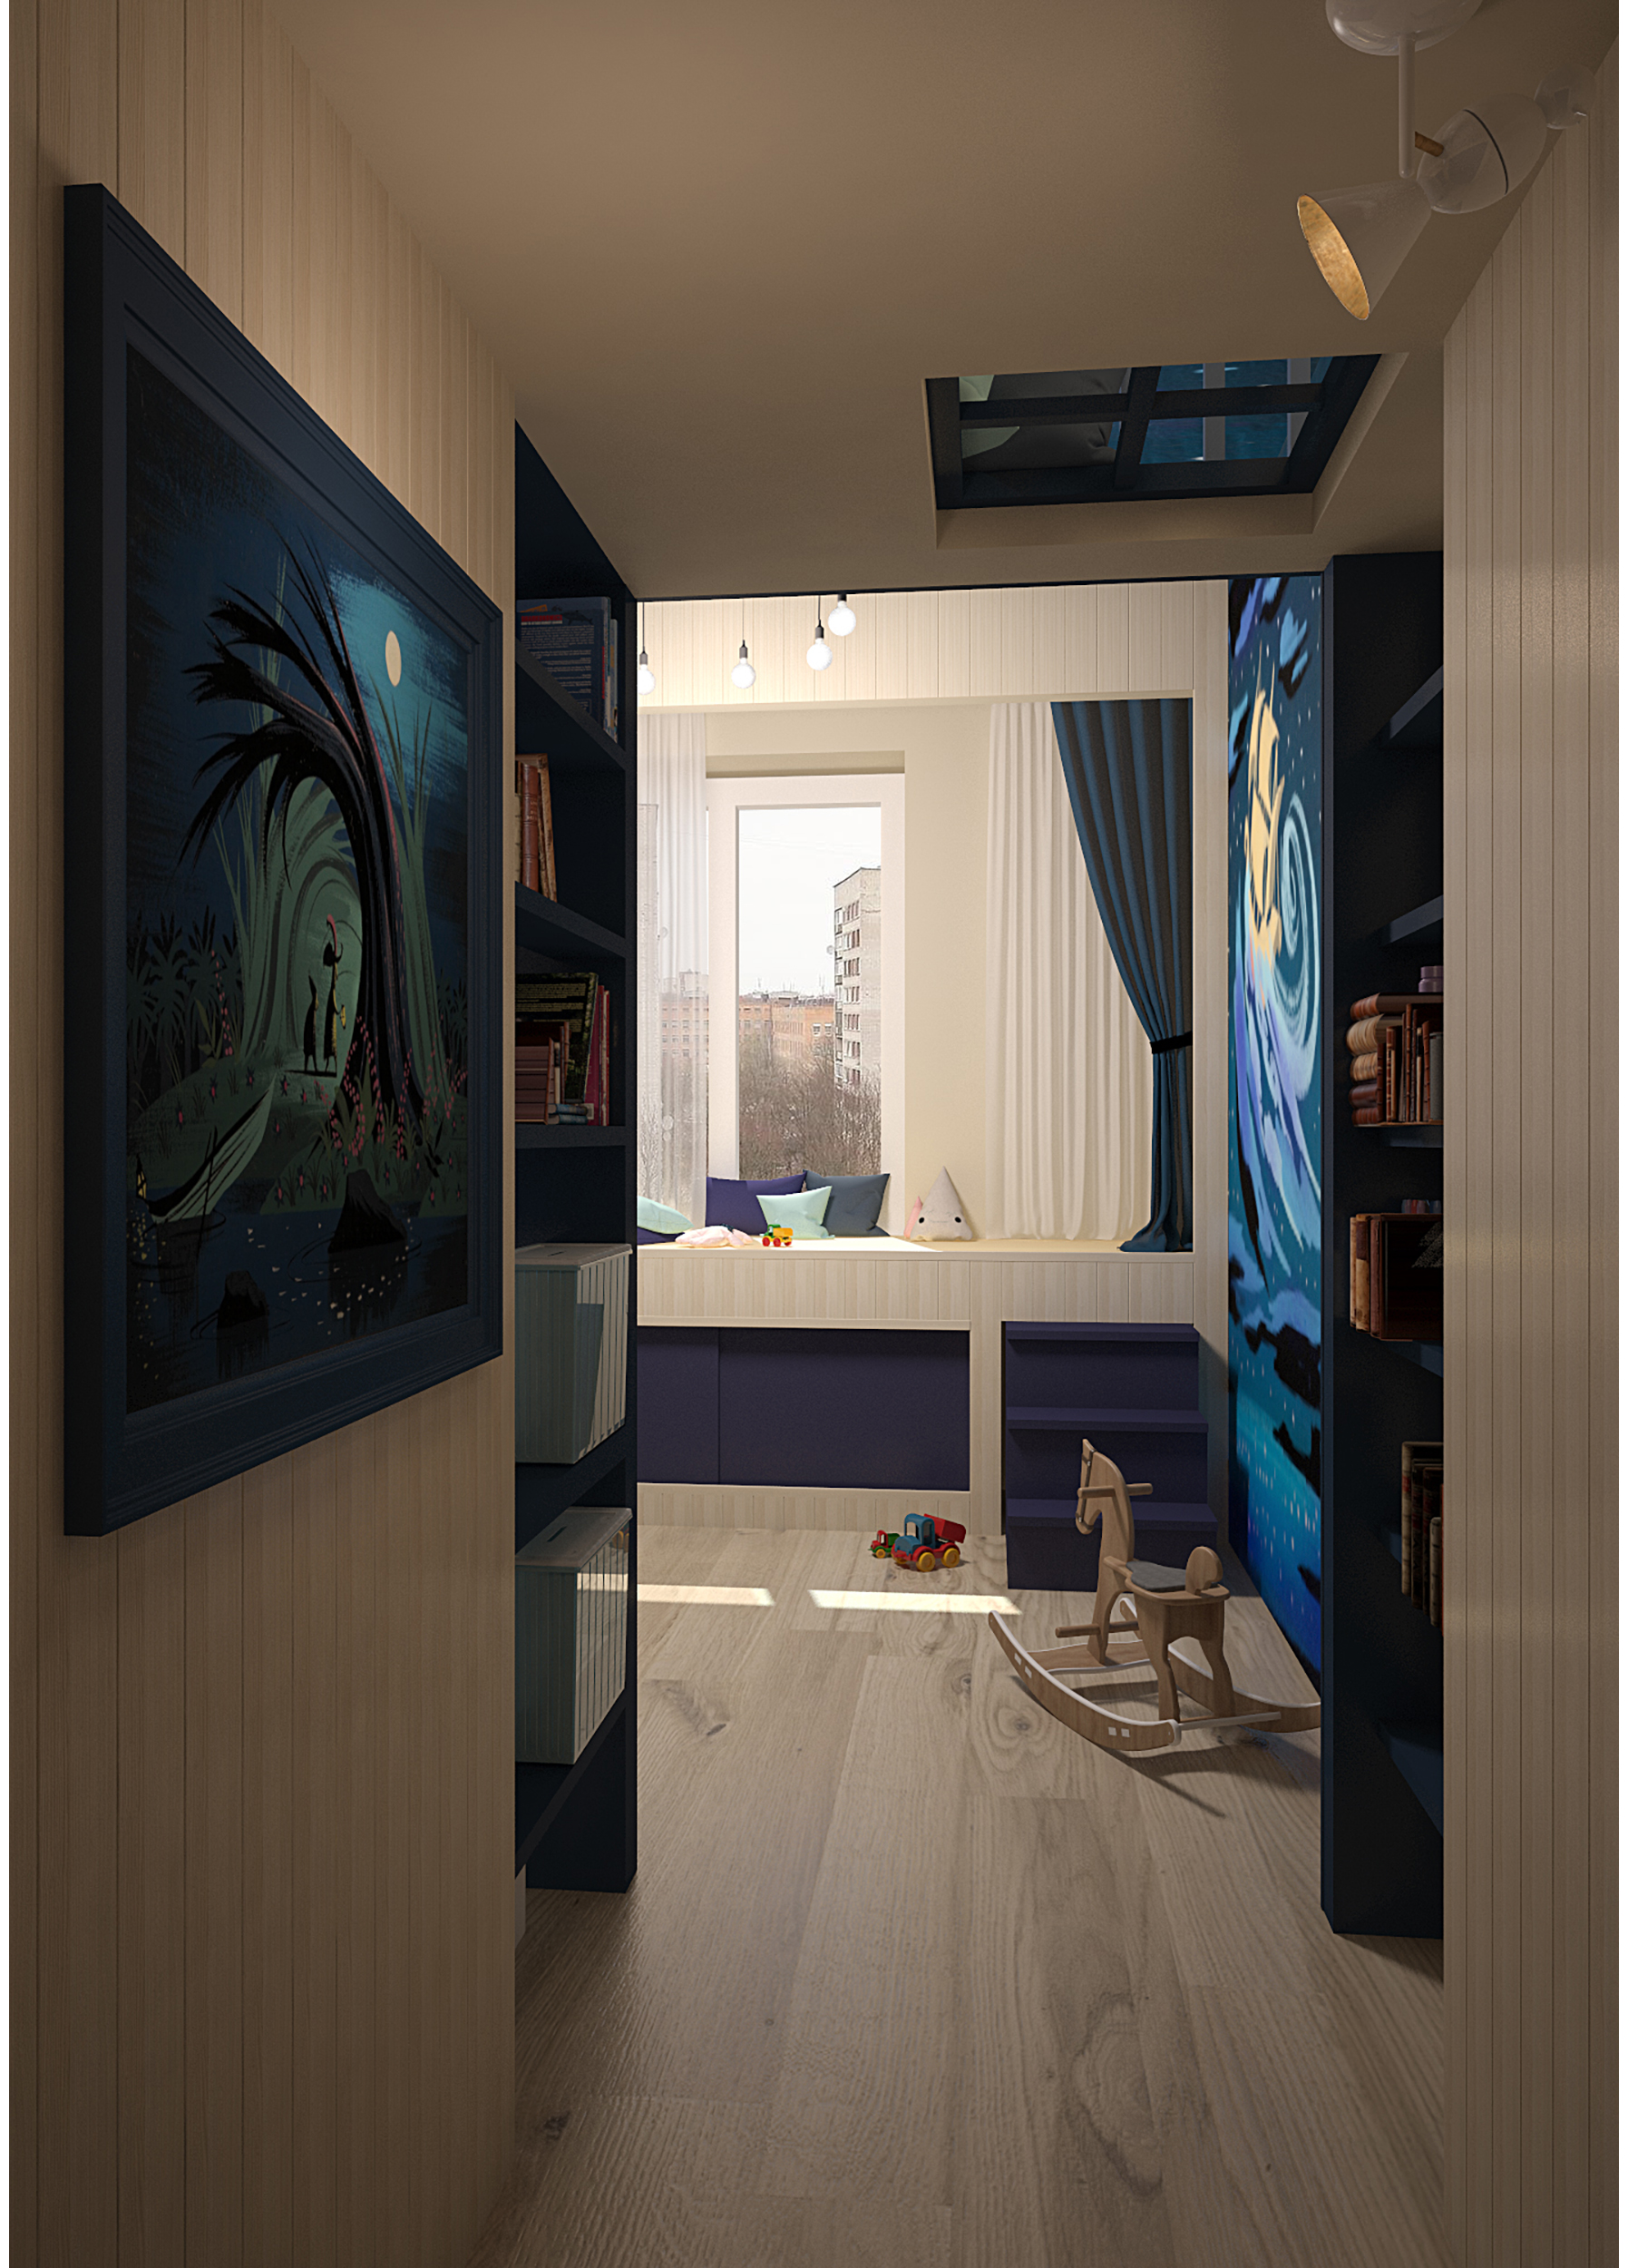 Copy of Boy bedroom. Peter Pan style.